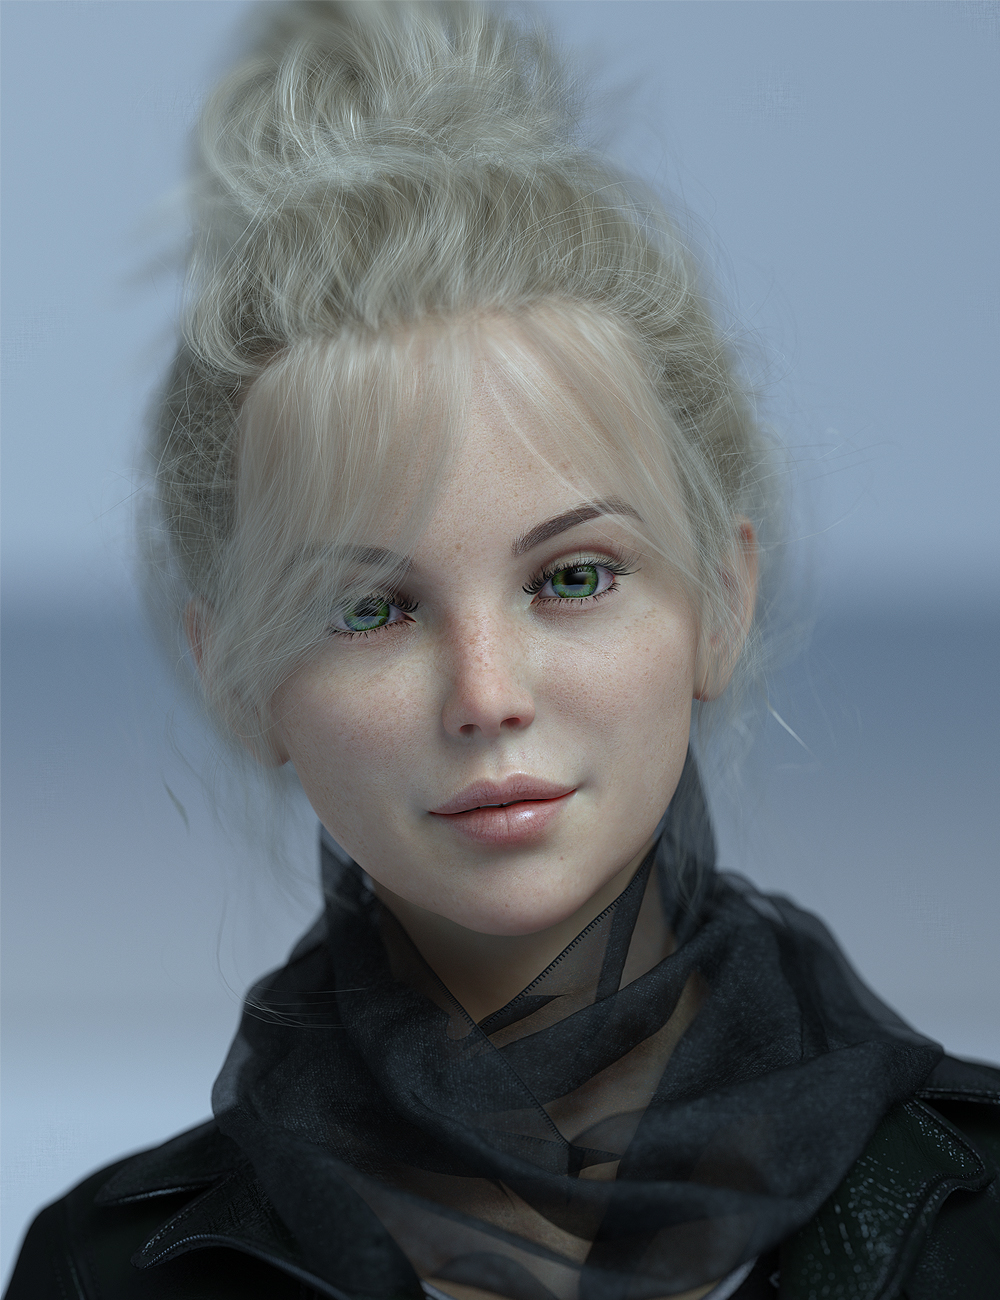 MR Celiny for Genesis 8 Female by: Marcius, 3D Models by Daz 3D